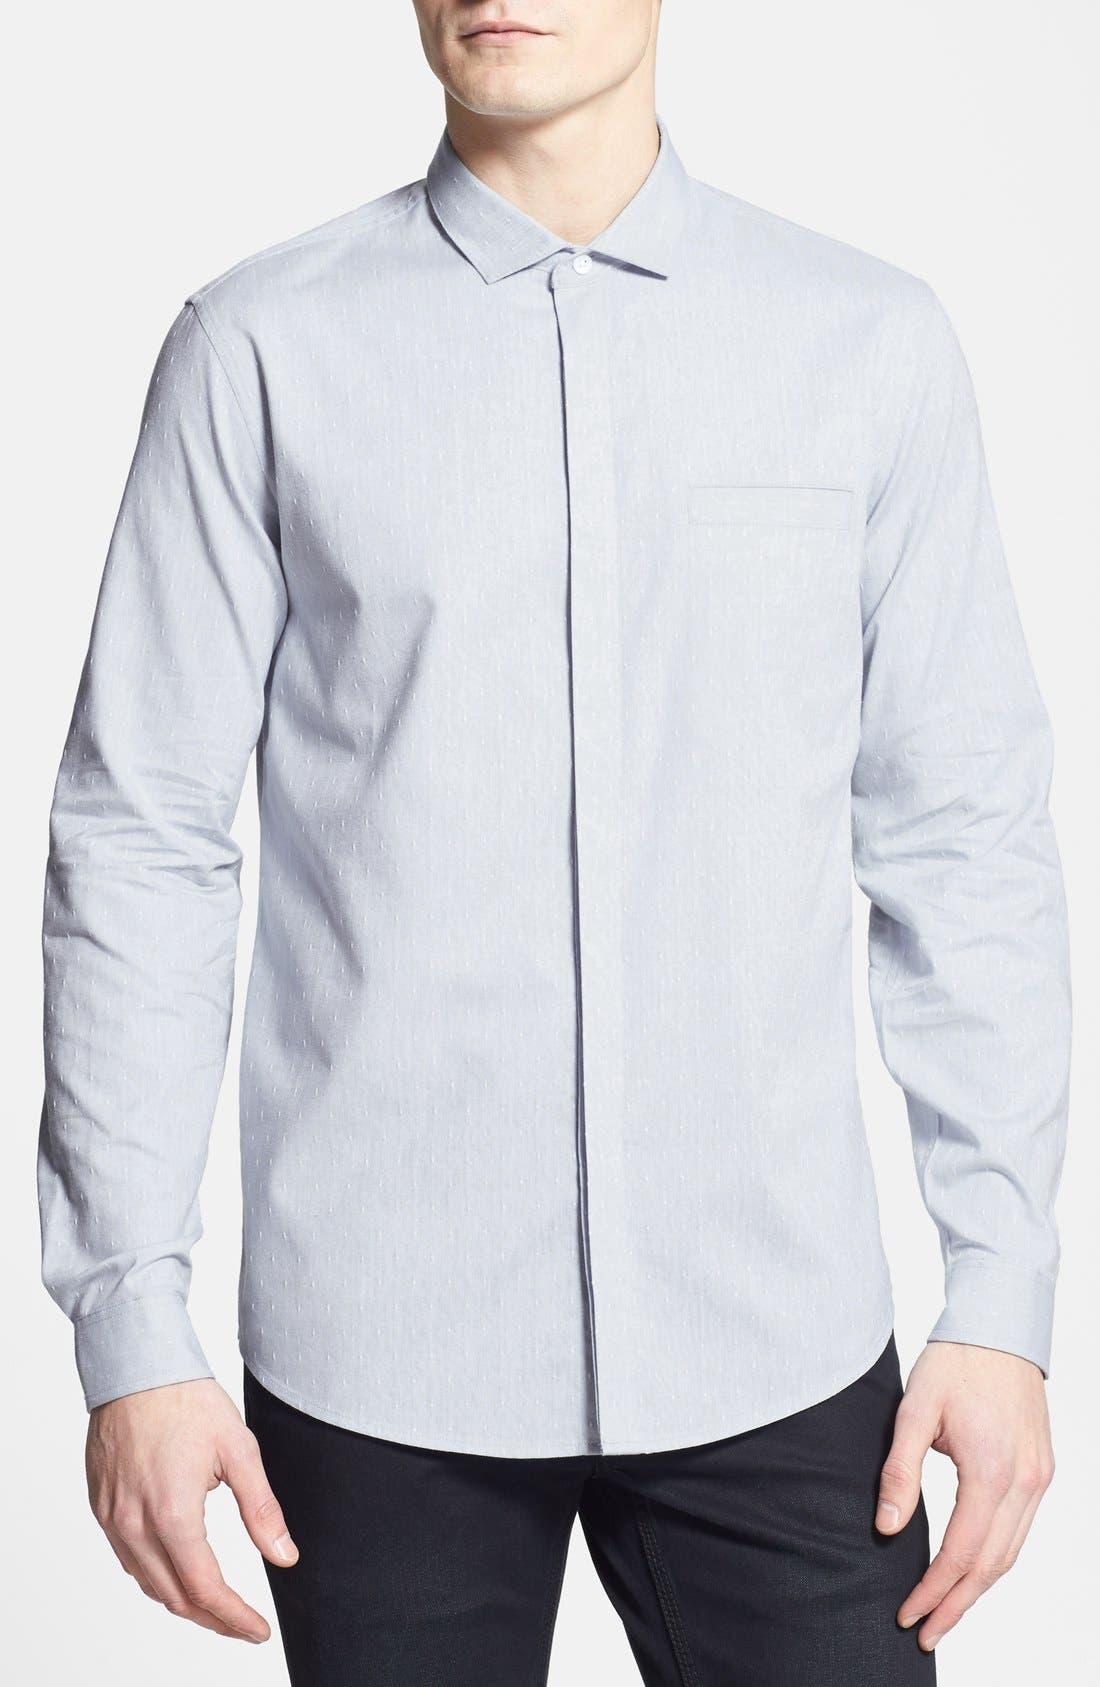 Alternate Image 1 Selected - Topman Slim Fit Dobby Shirt